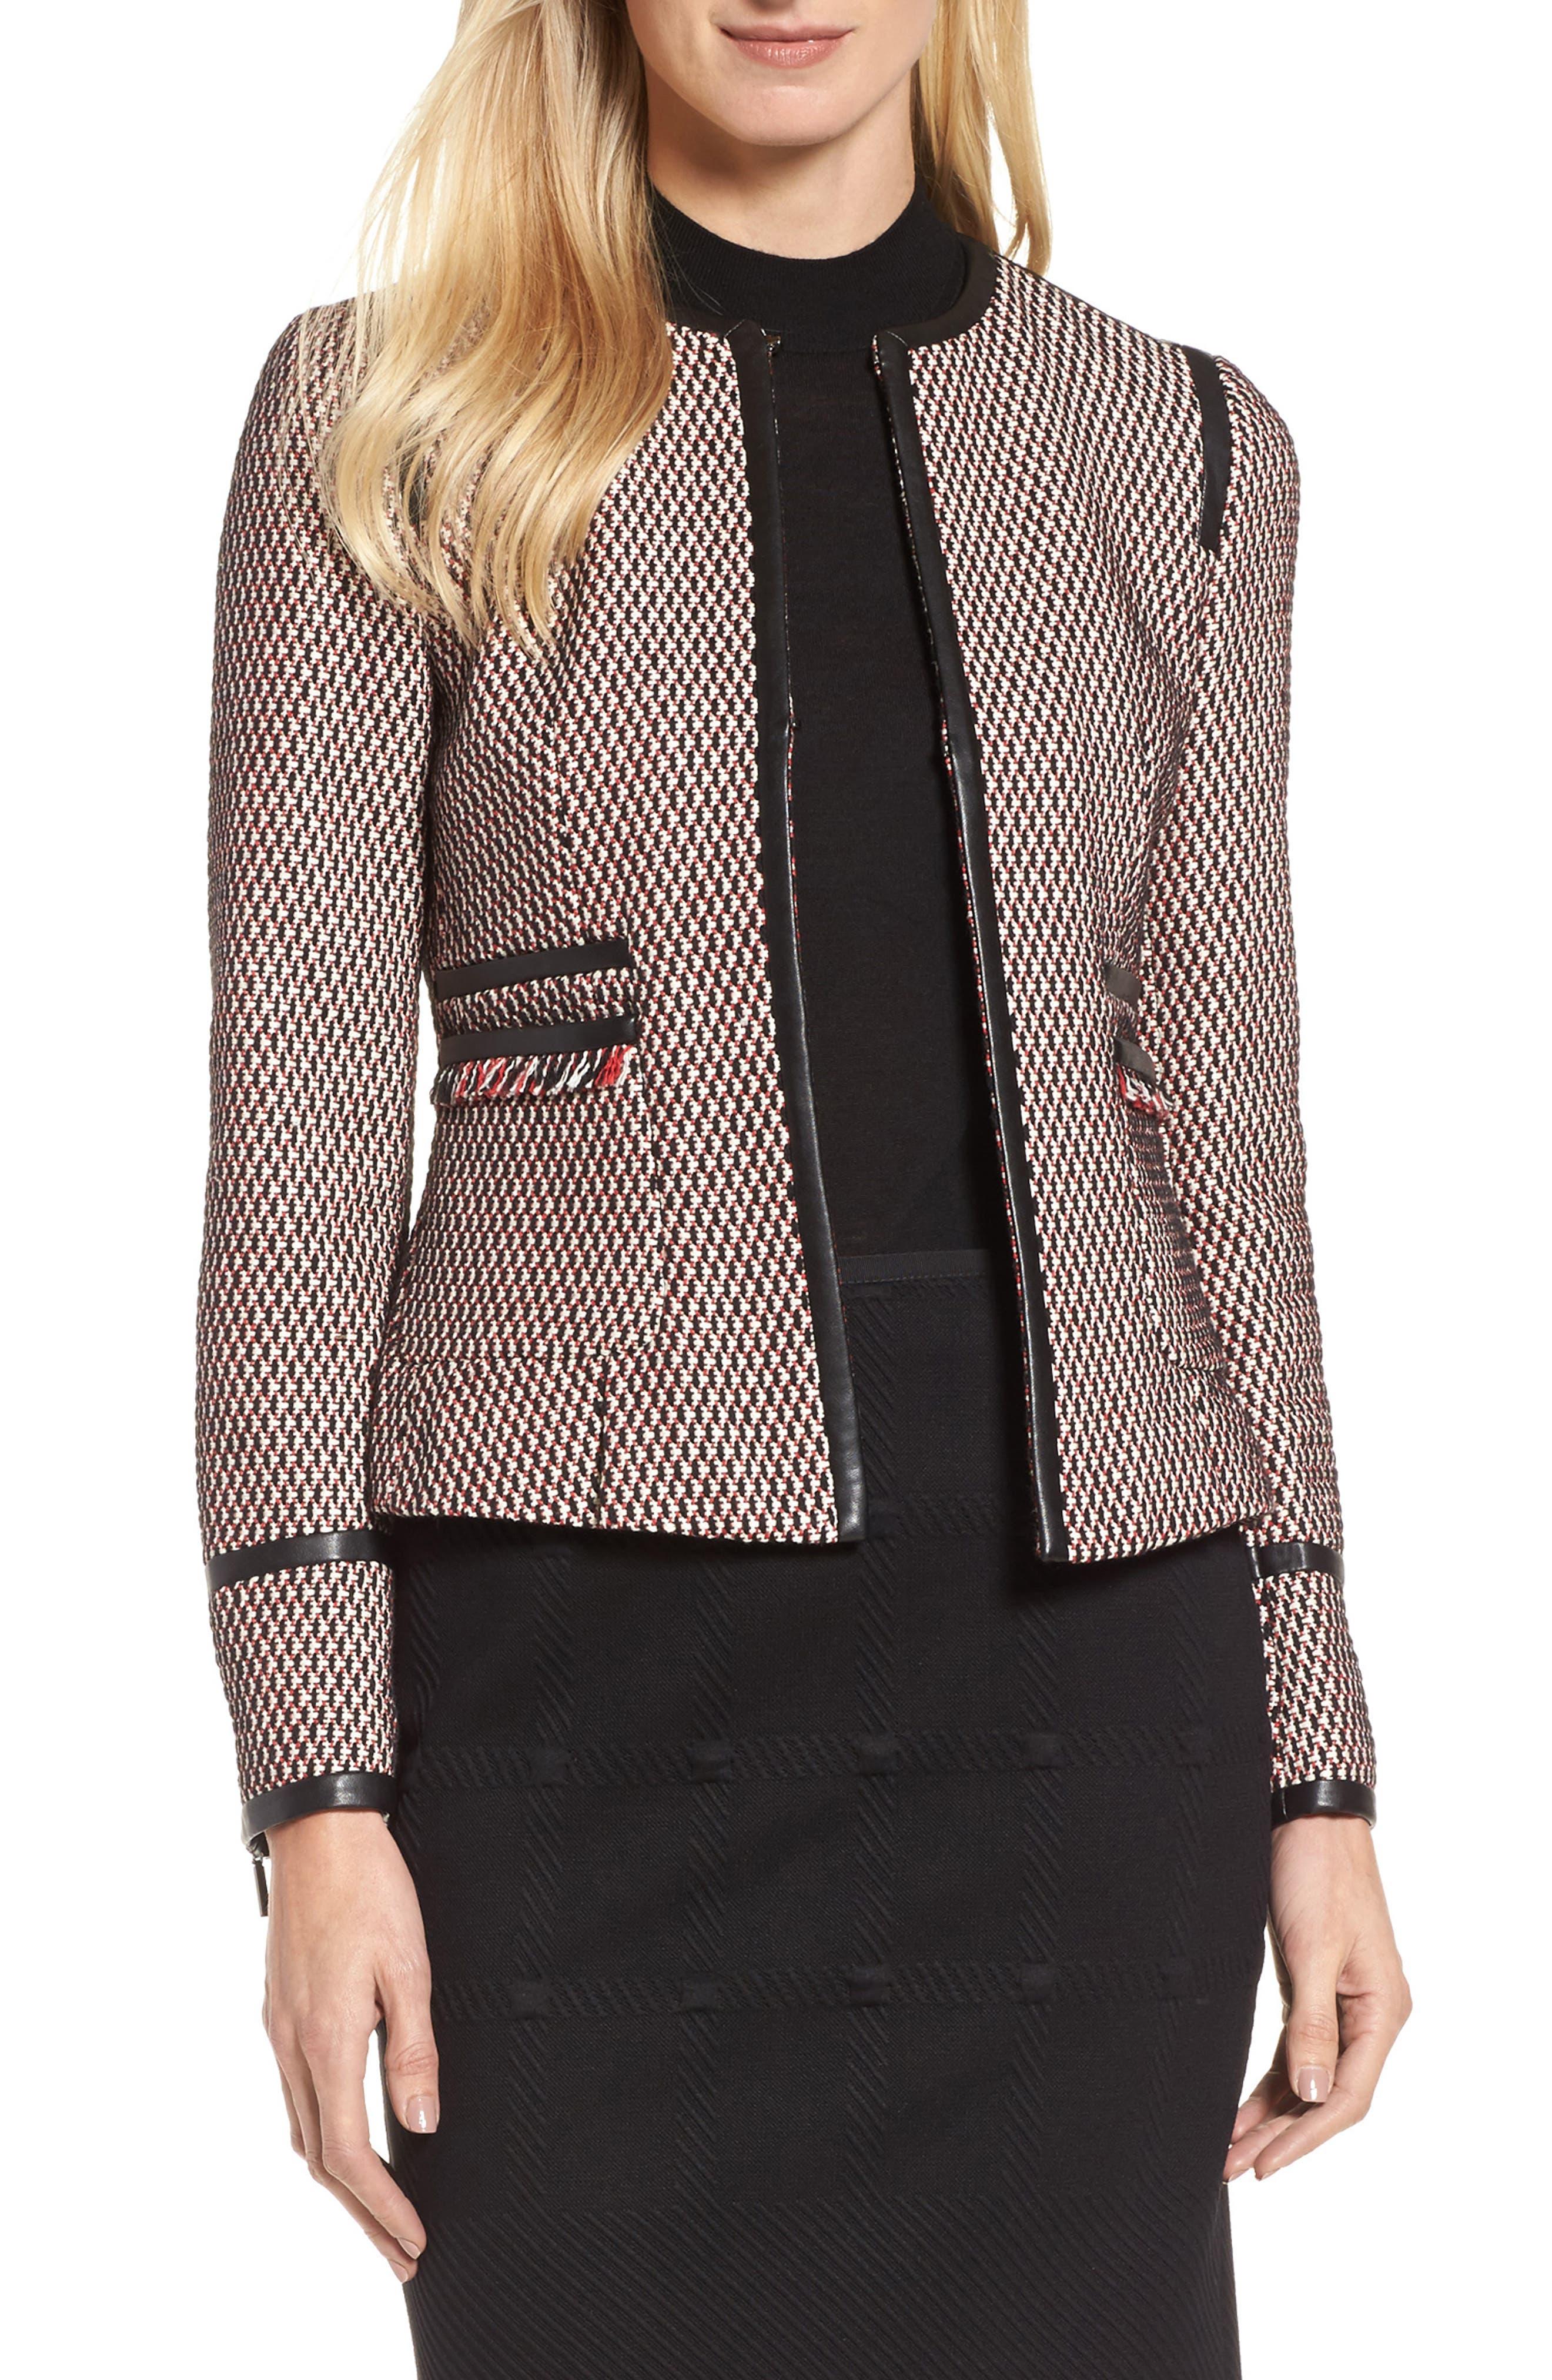 Keili Collarless Tweed Jacket,                         Main,                         color, Vanilla Fantasy